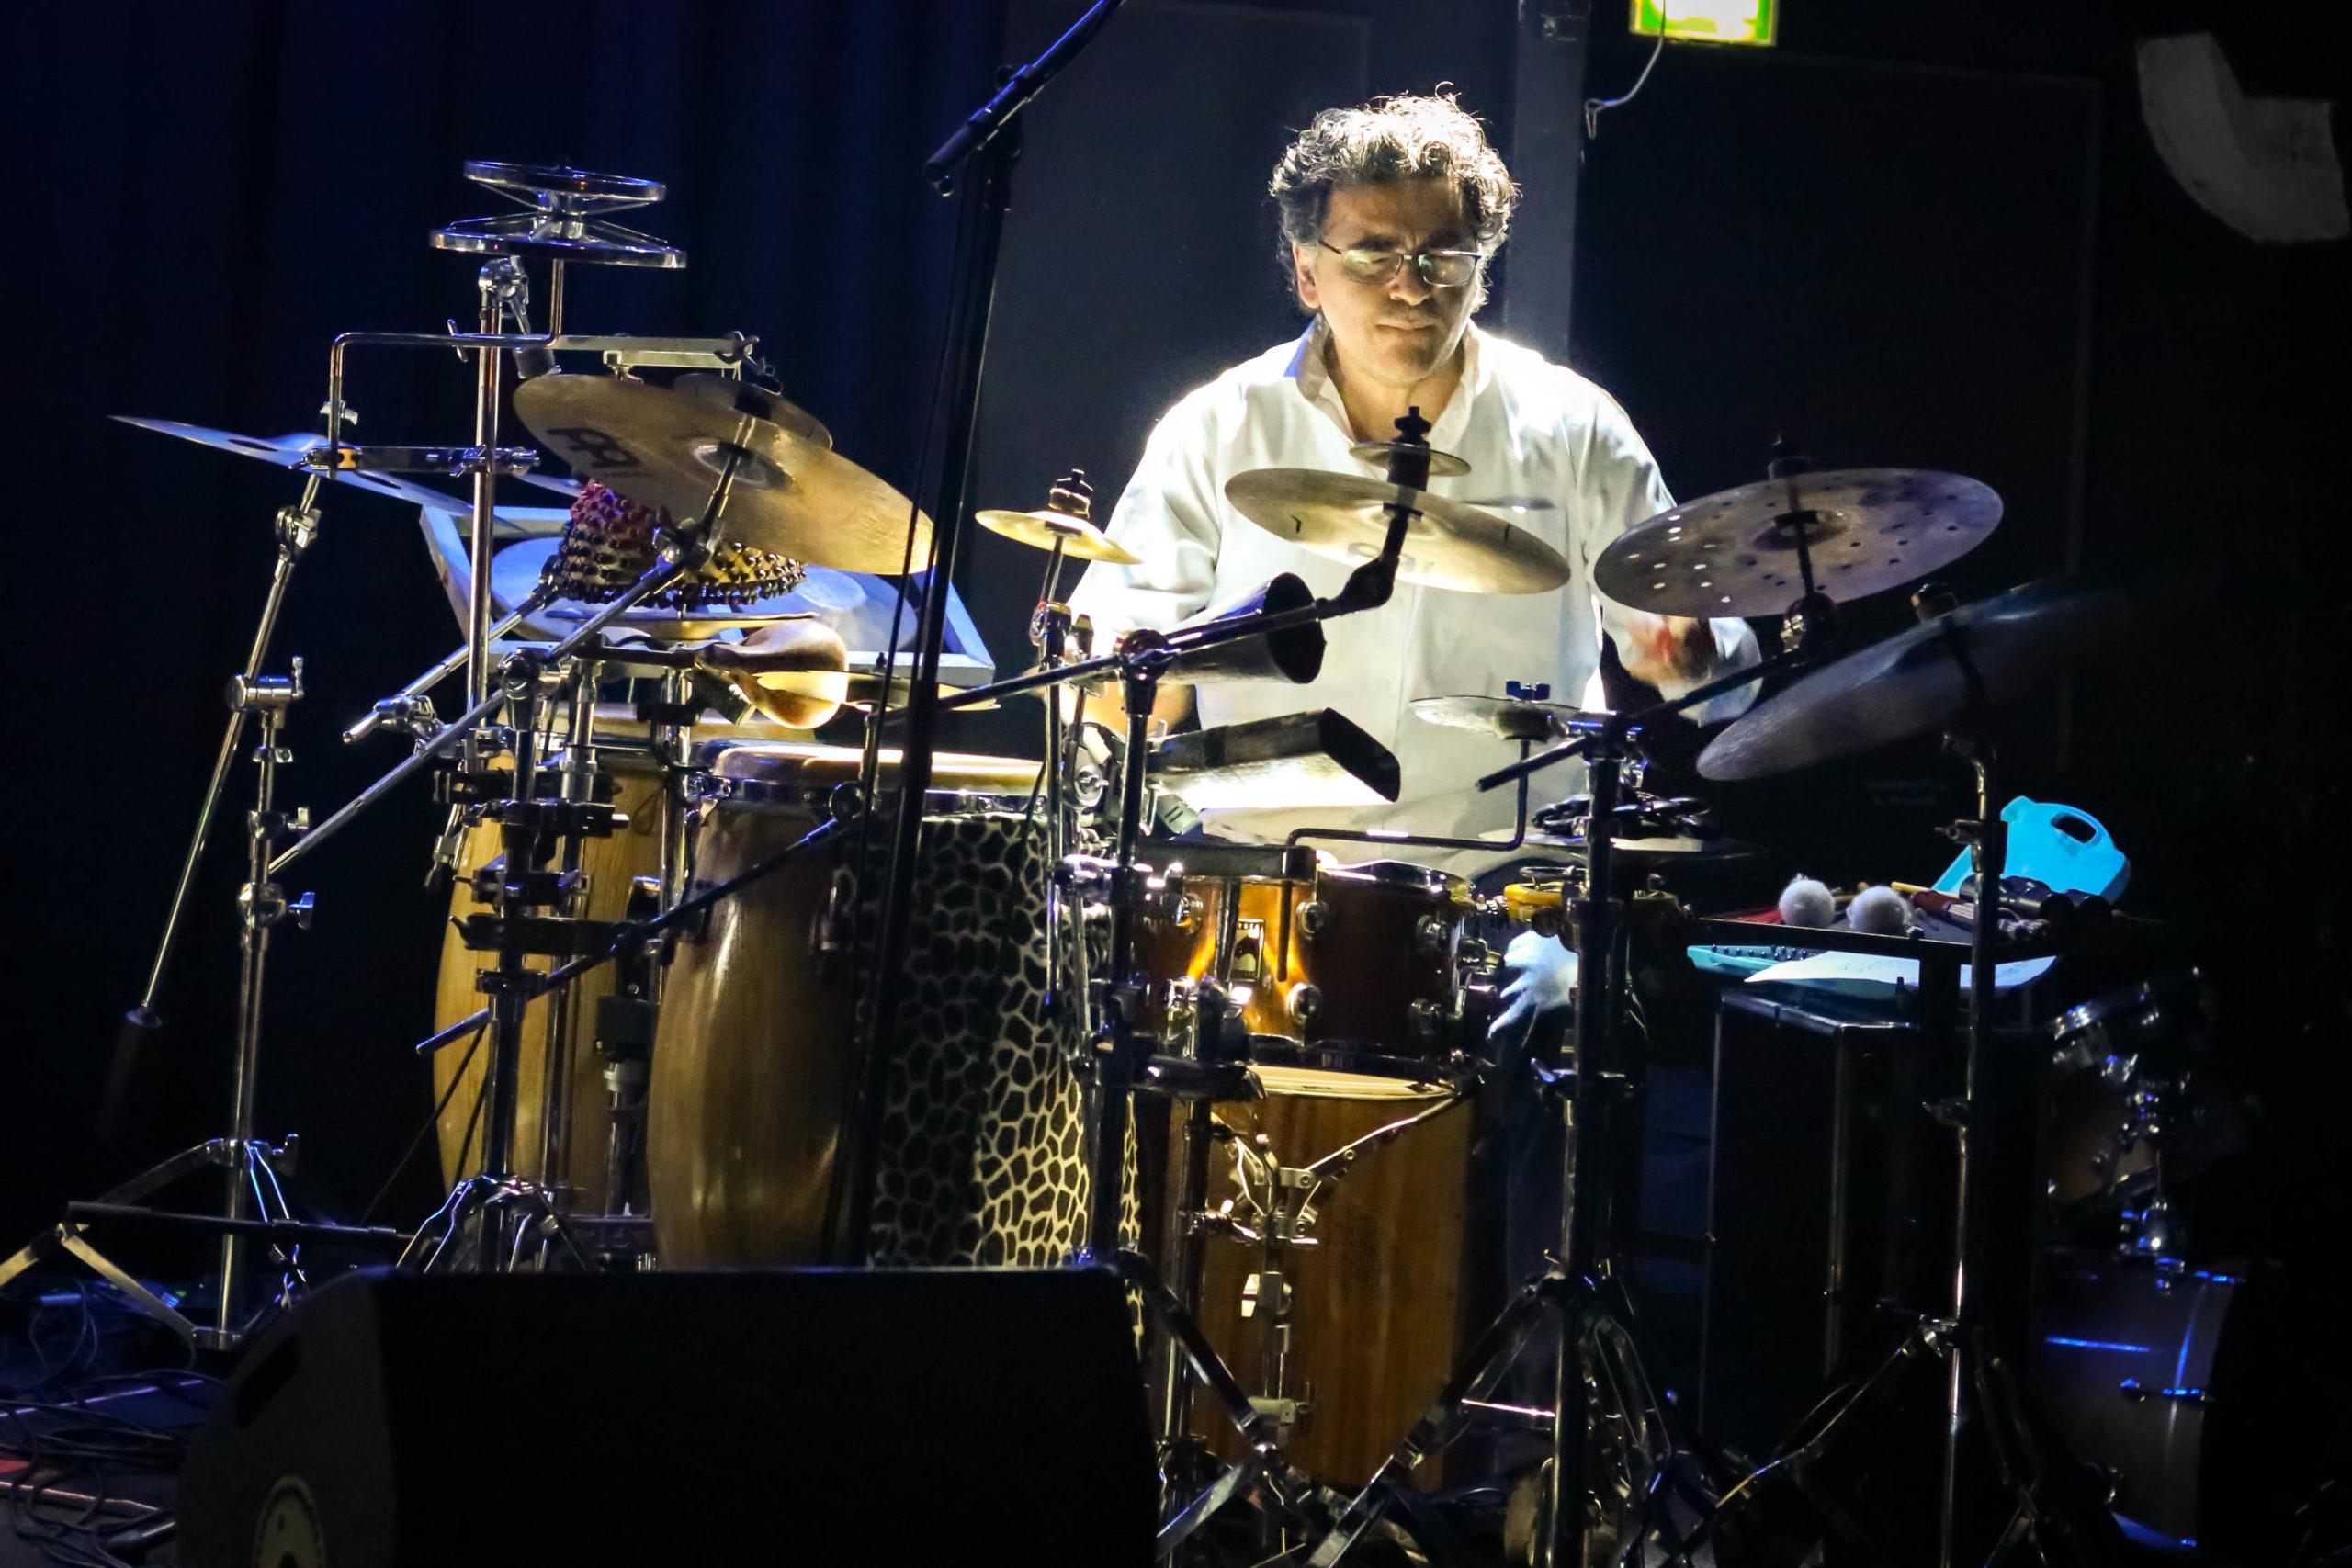 Jorge Costagliola aux percussions